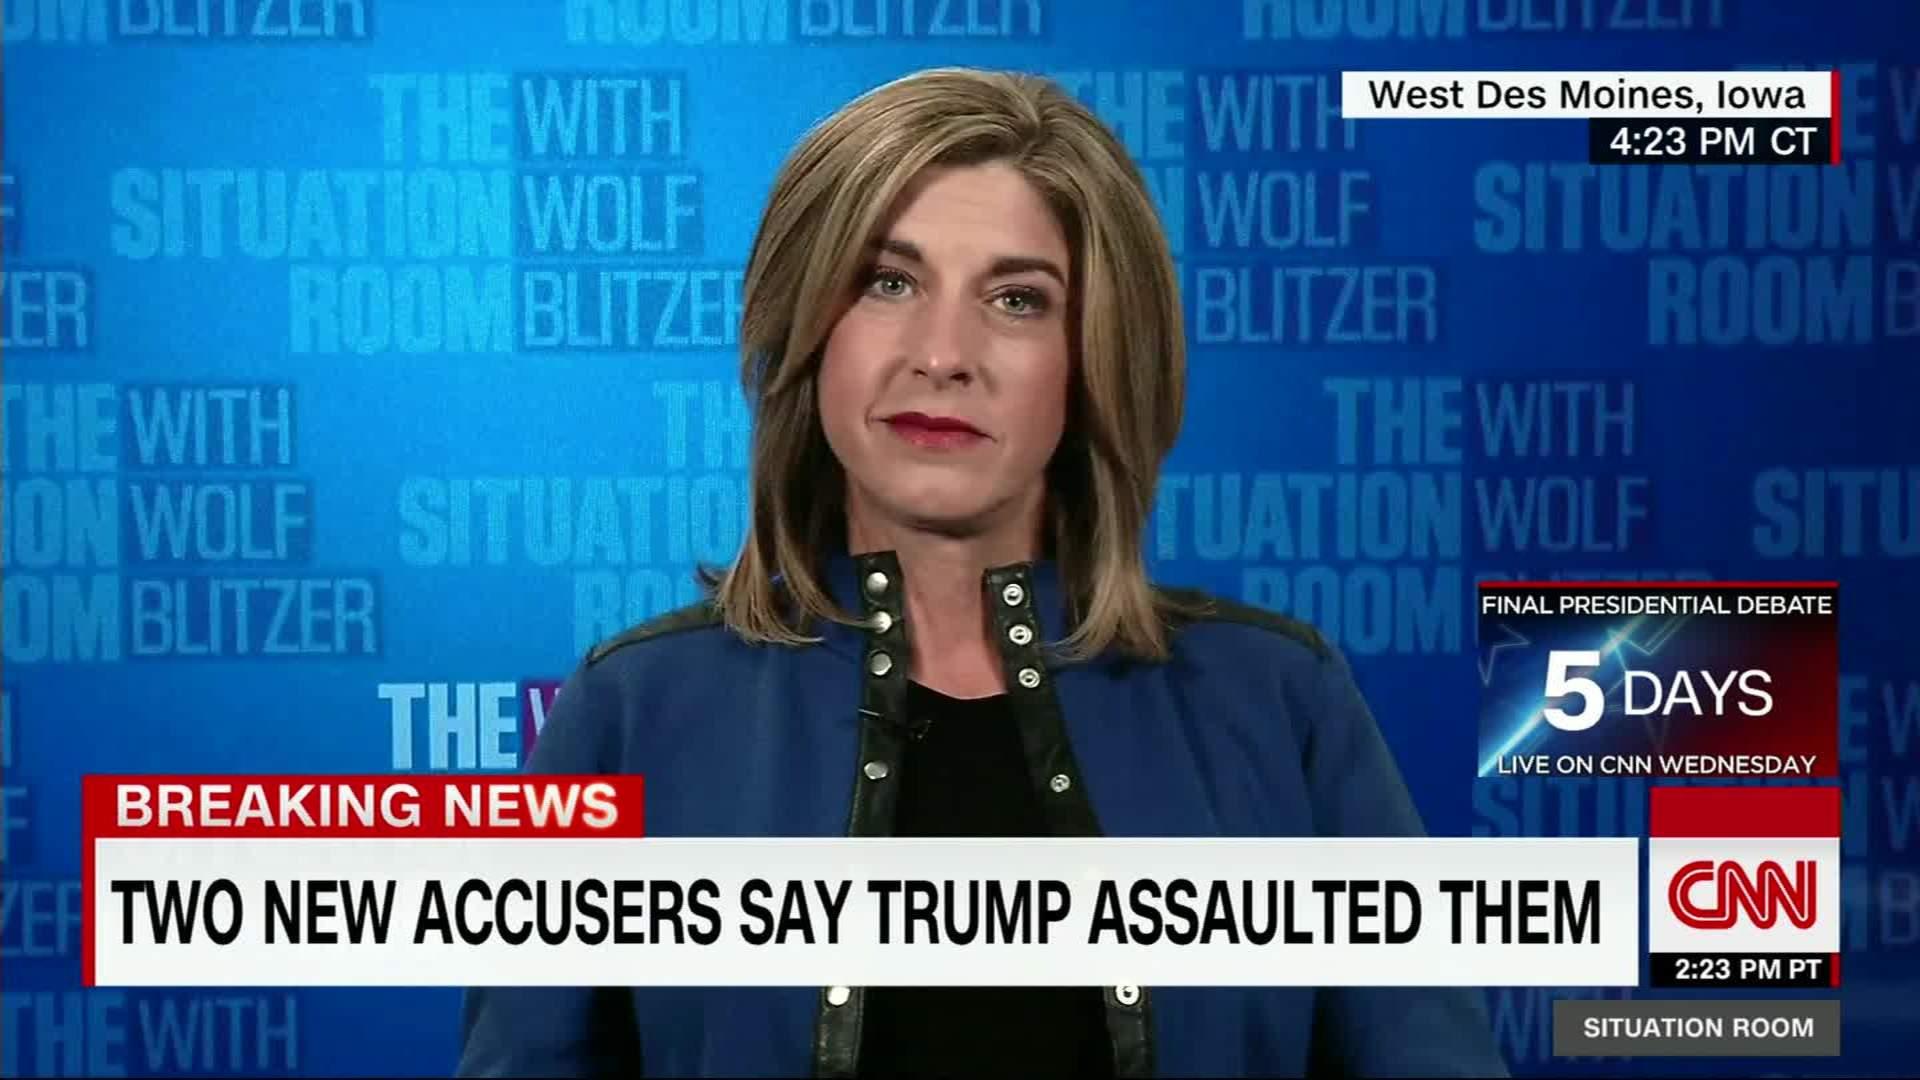 Female Trump Adviser: I Canu0027t Have Empathy For Accusers   CNN Video